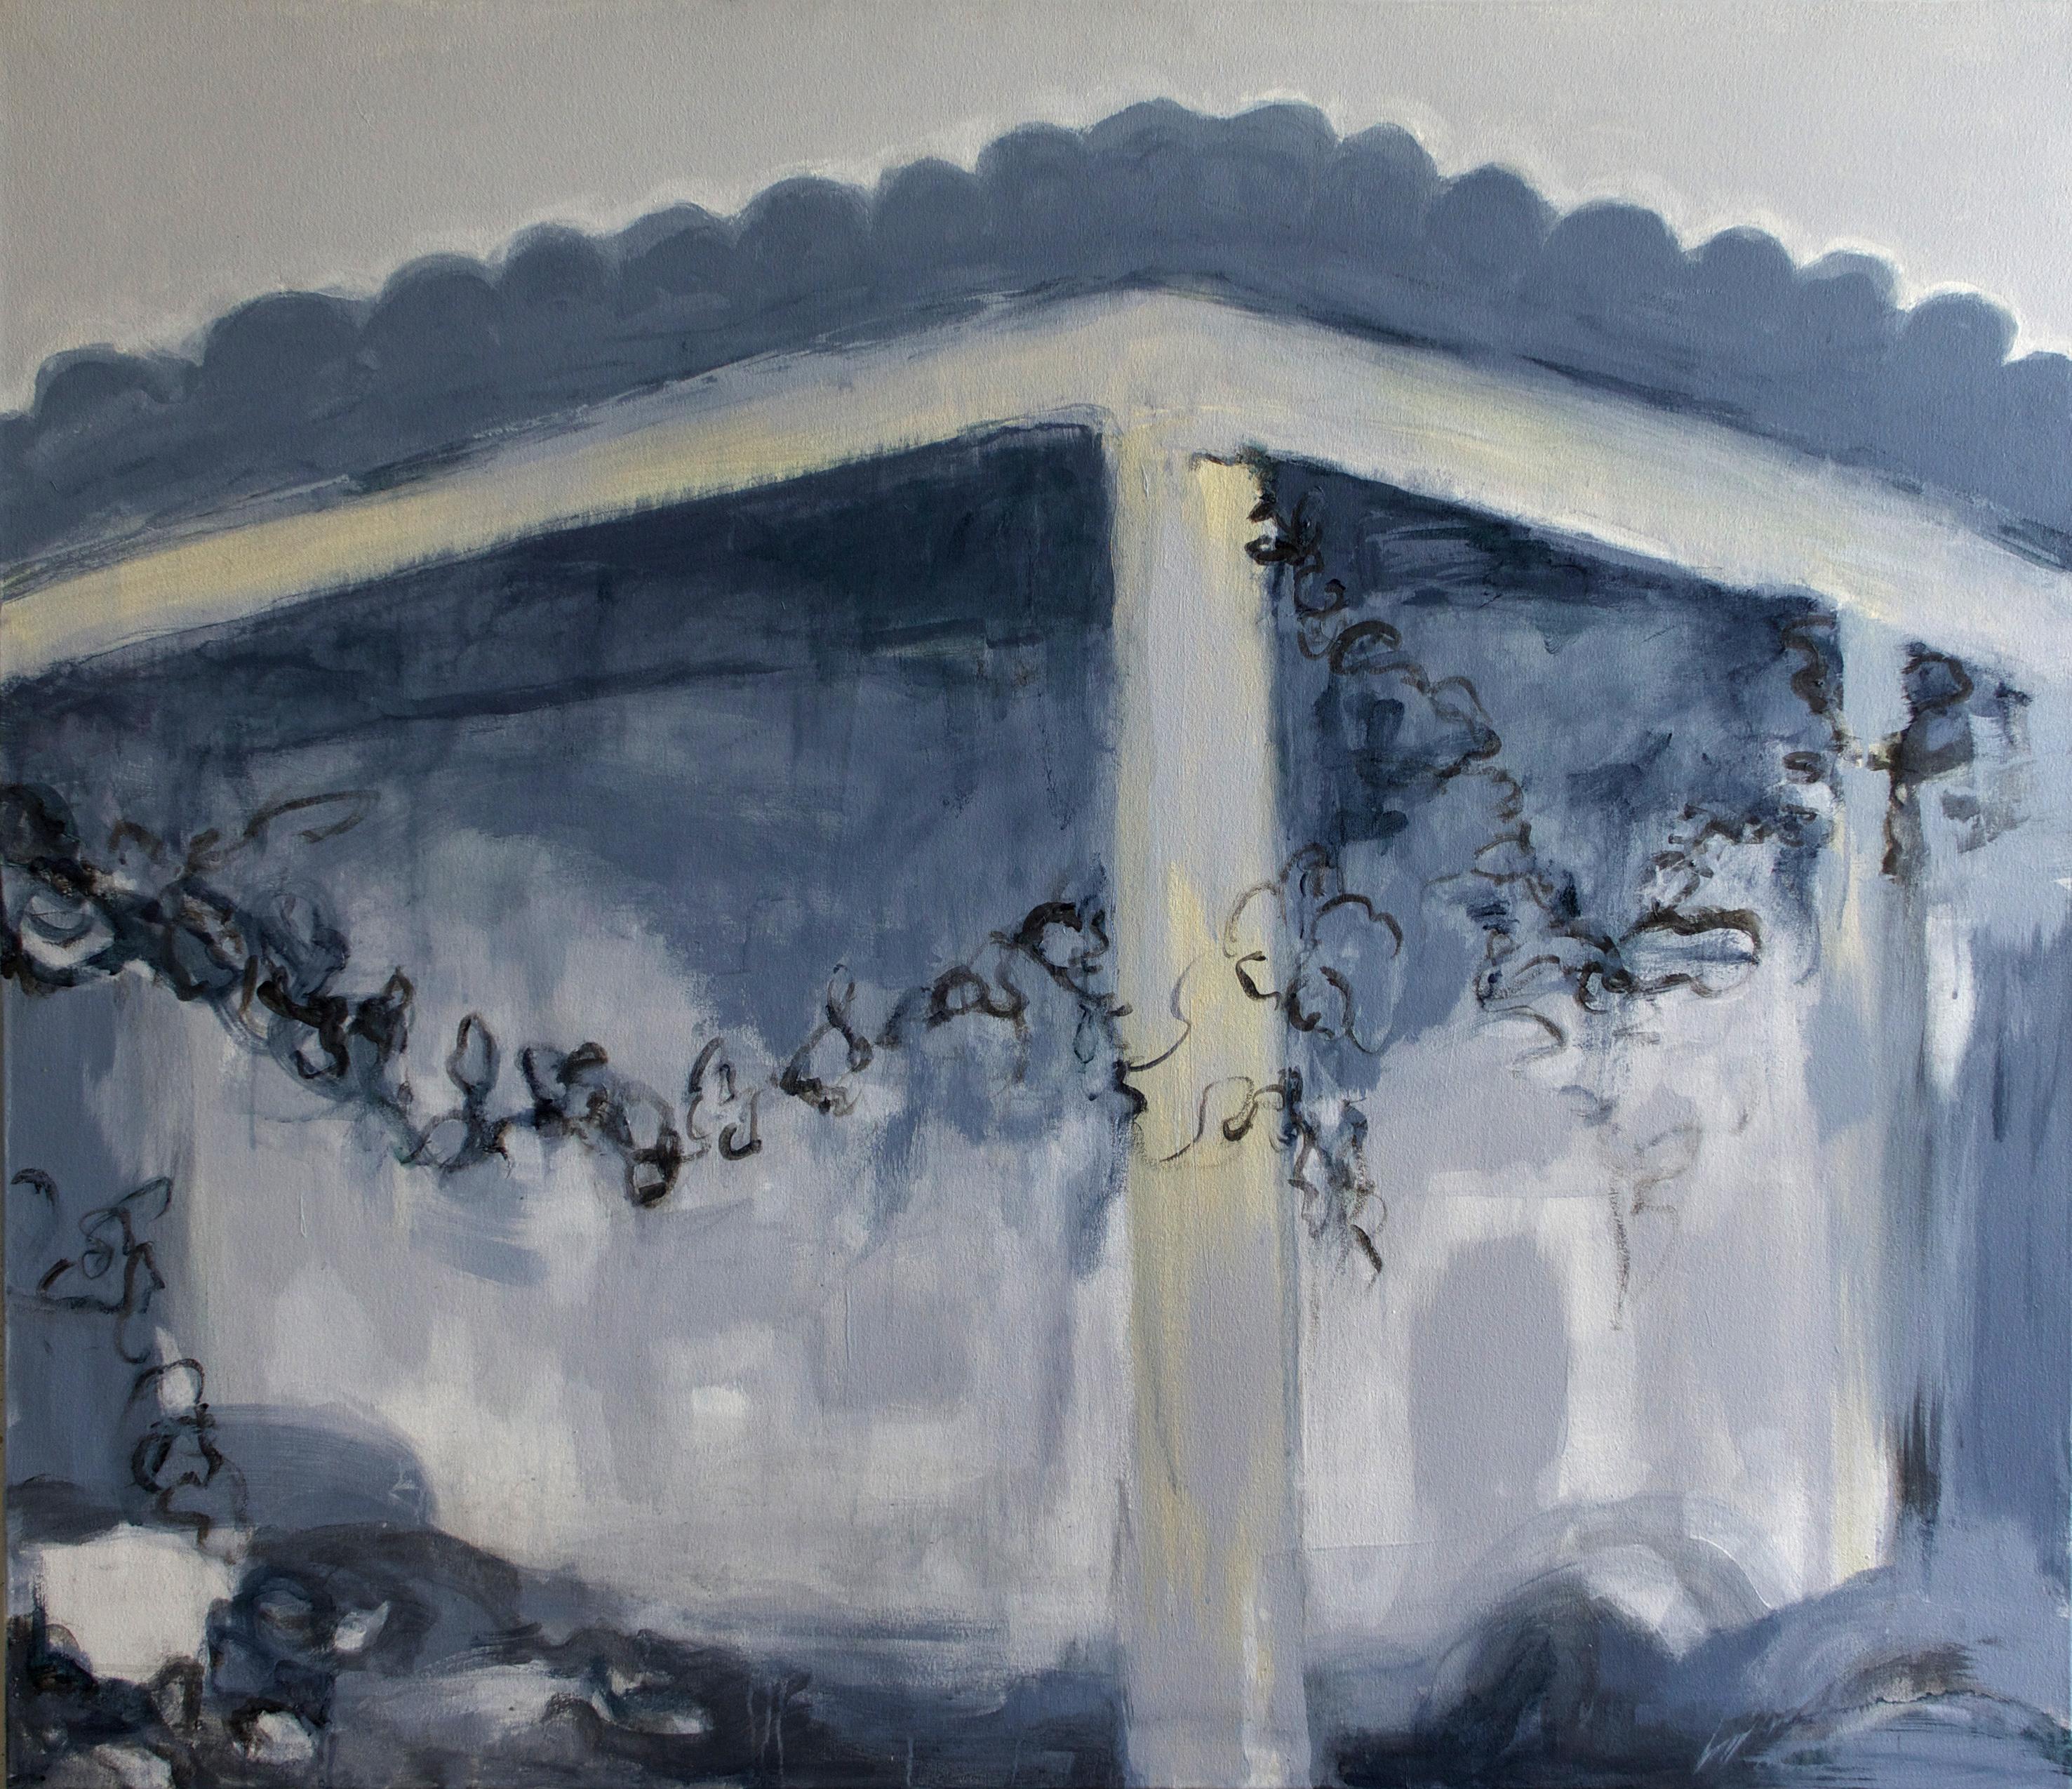 Runoilijan talo, 113x130cm, akryyli 2012